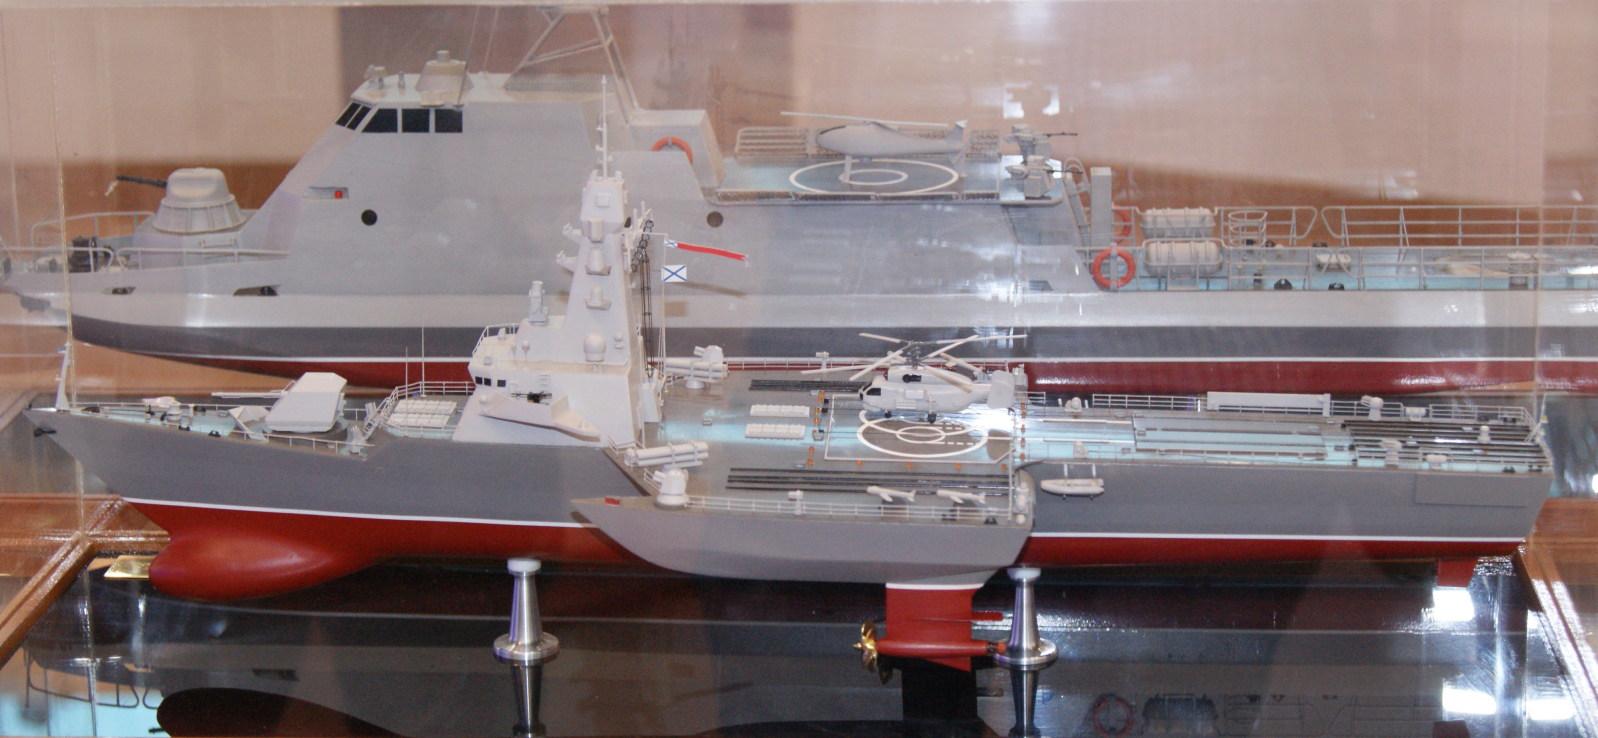 2015 Naval Show - St. Petersburg 2ir7kw6